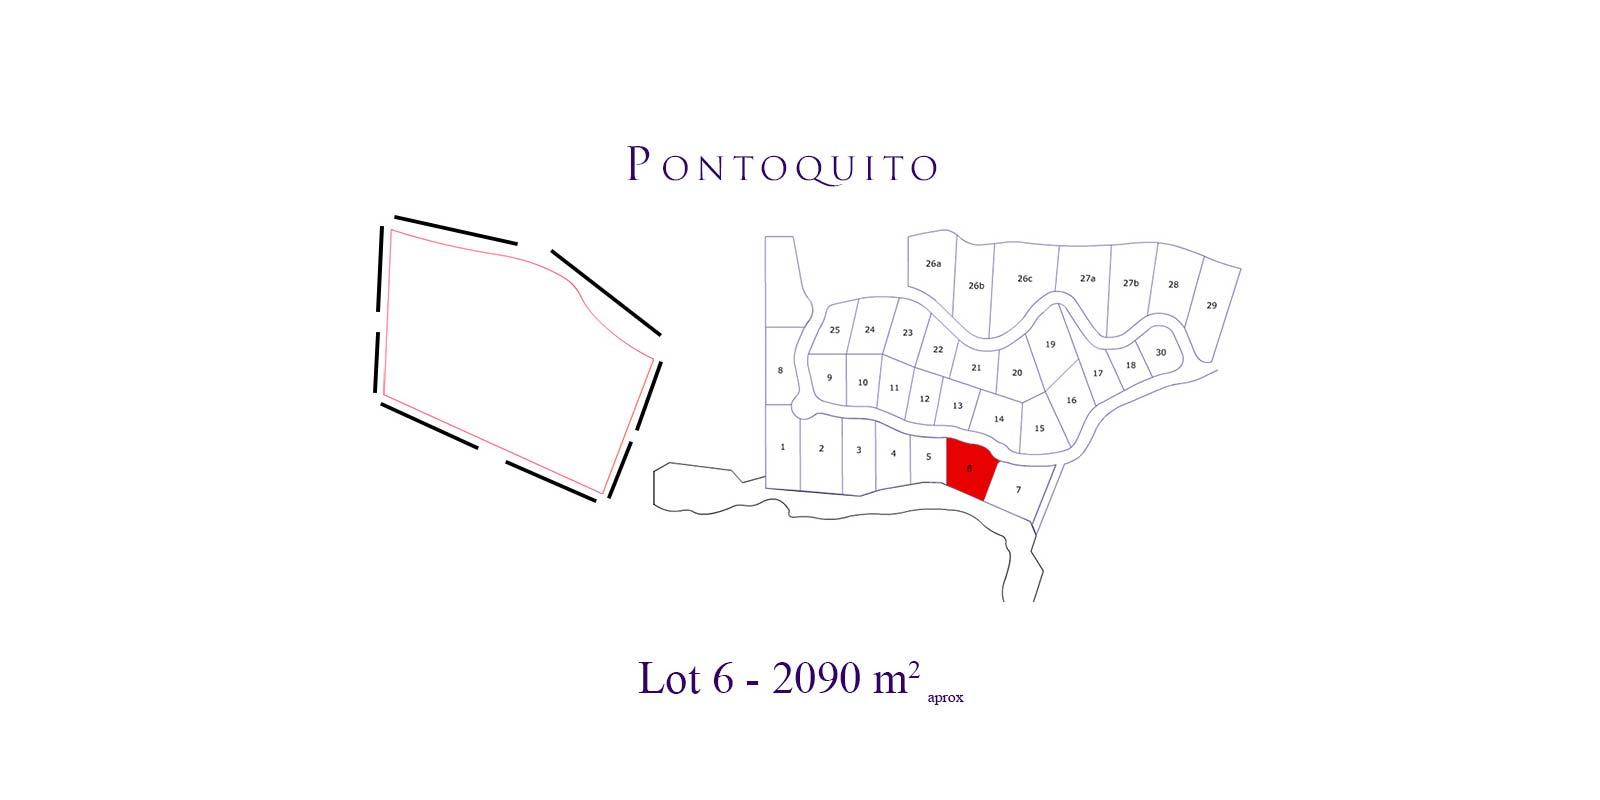 Pontoquito - Lot 6 - Punta de Mita luxury real estate